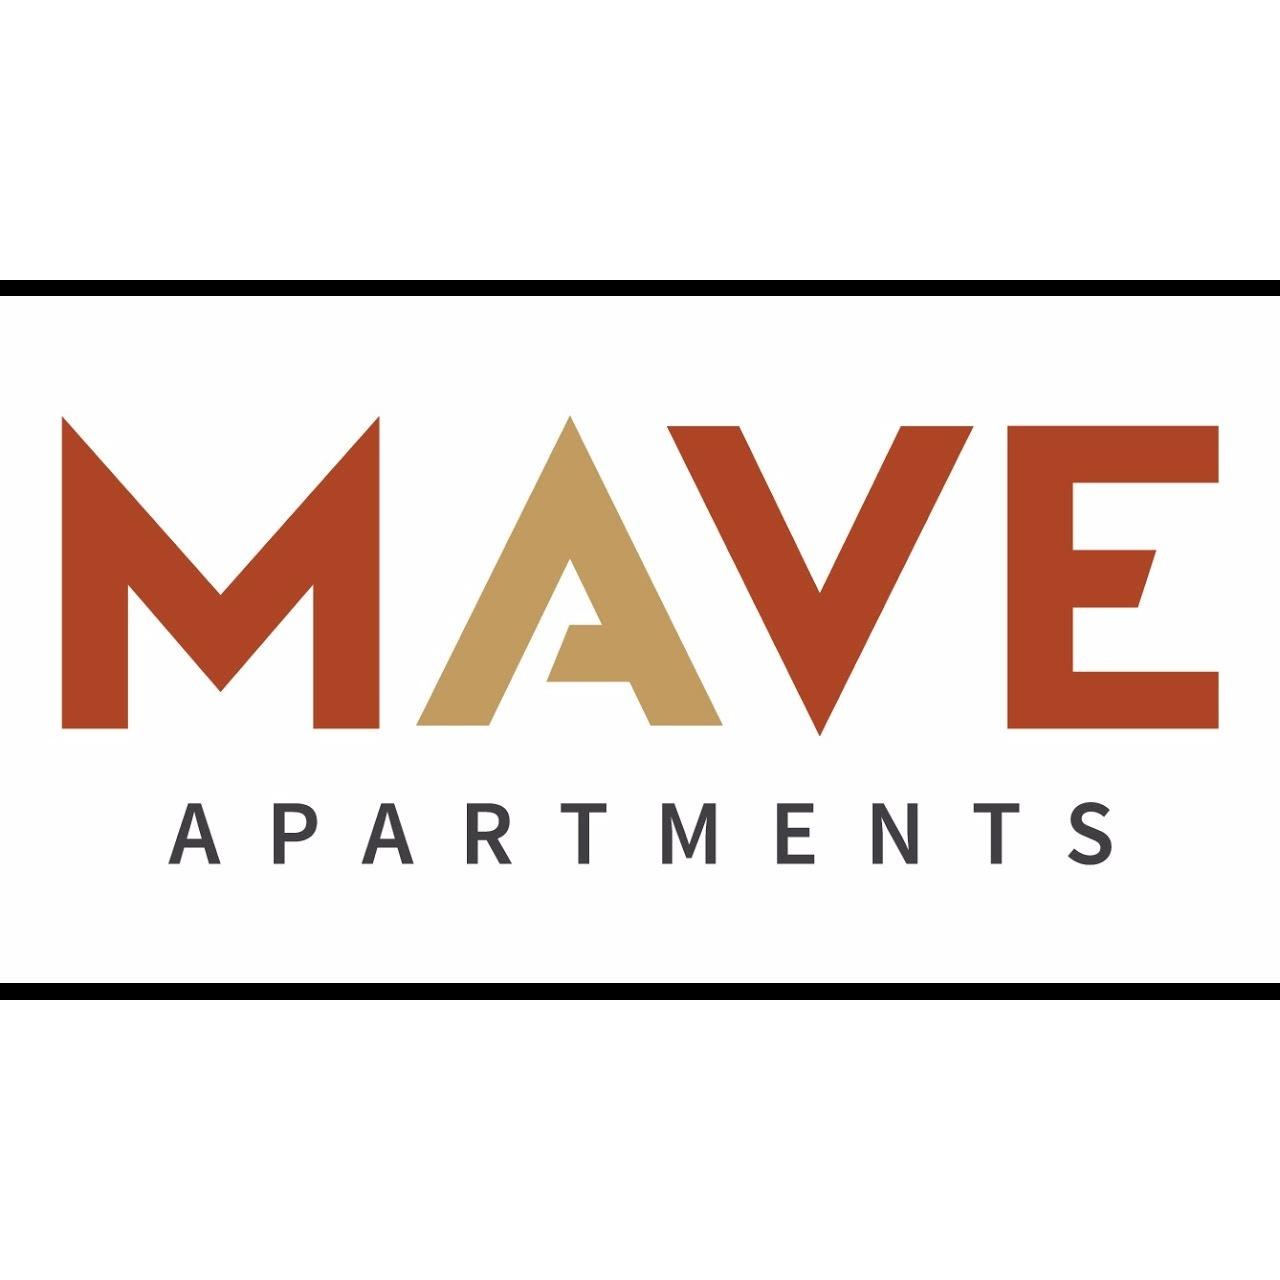 Mave Apartments